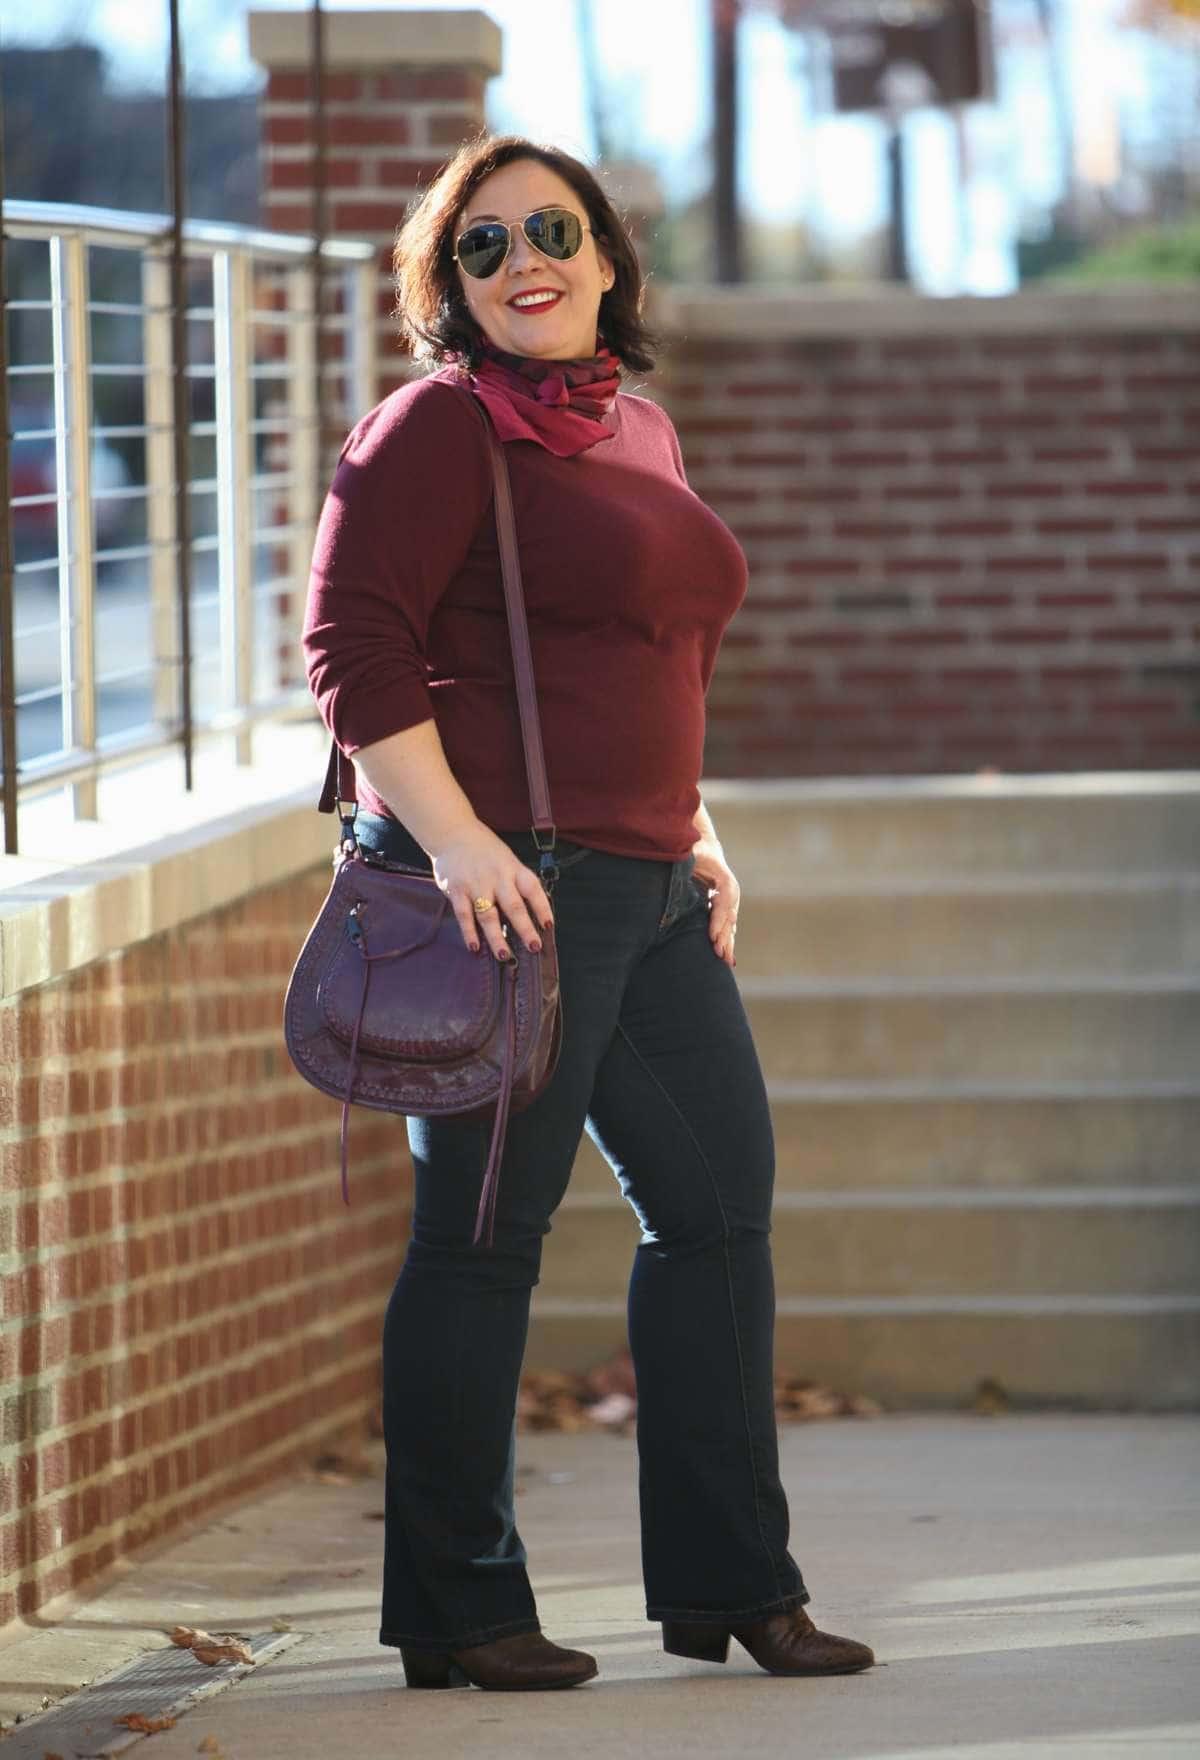 wardrobe-oxygen-over-40-fashion-blog